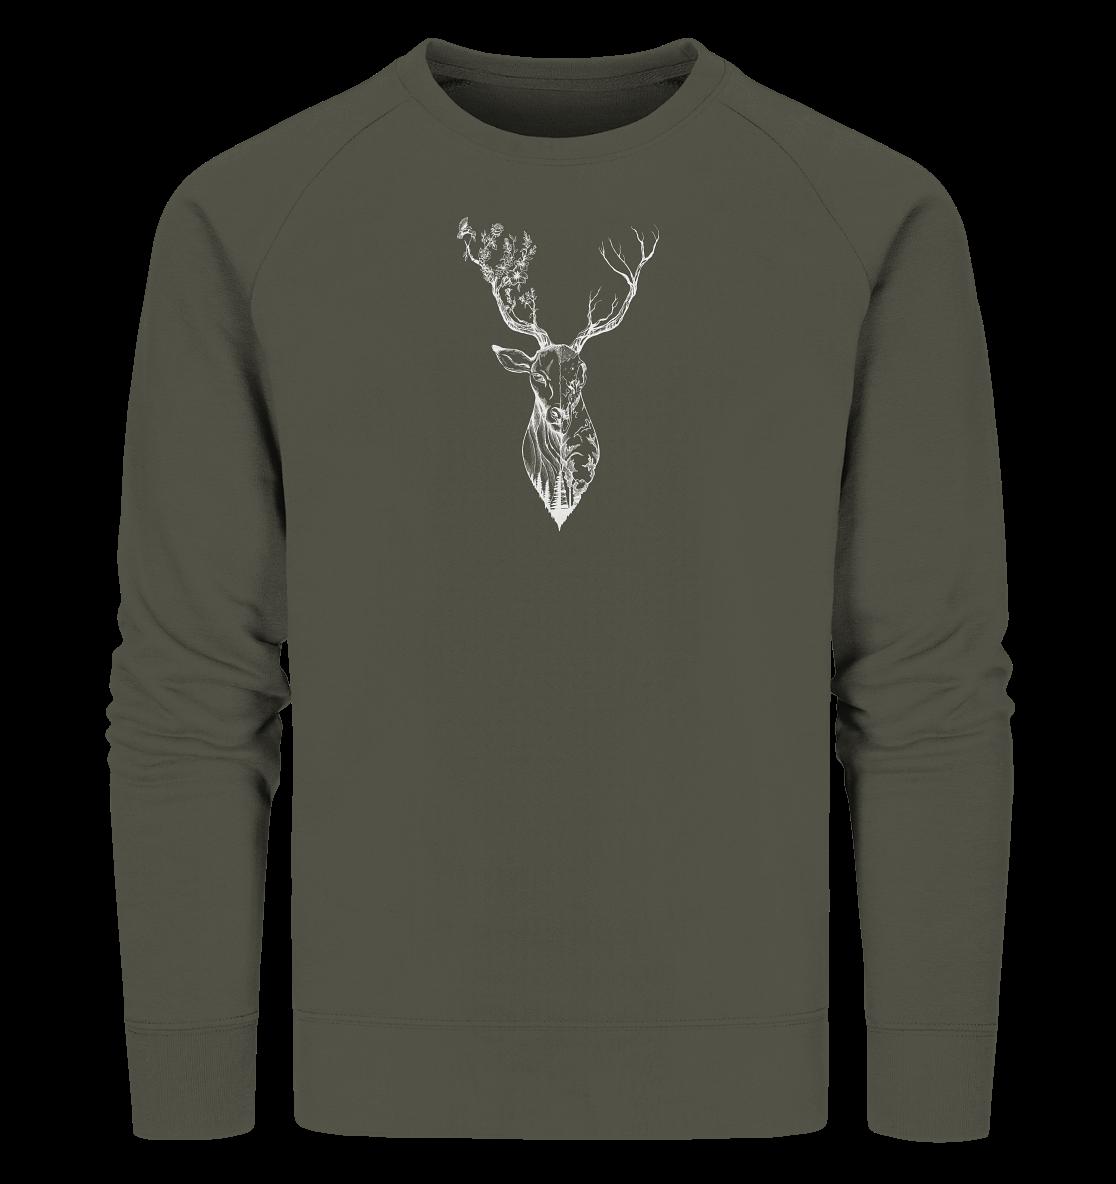 front-organic-sweatshirt-545348-1116x-5.png